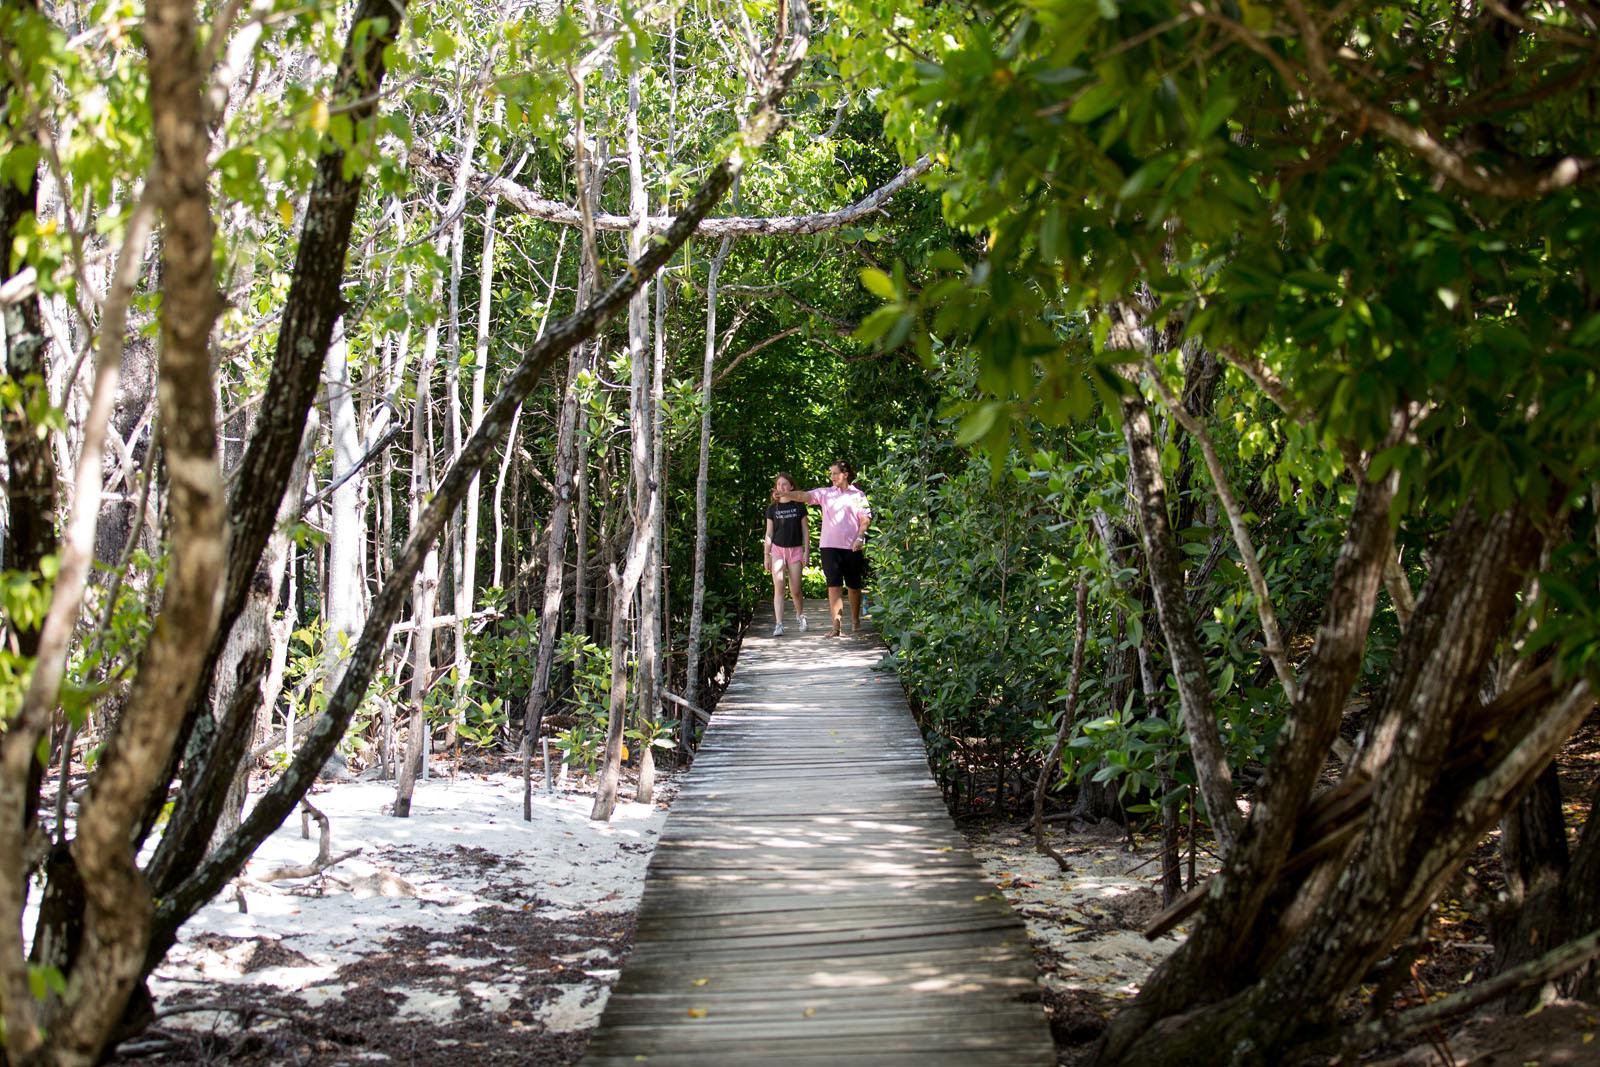 exploring the island itself